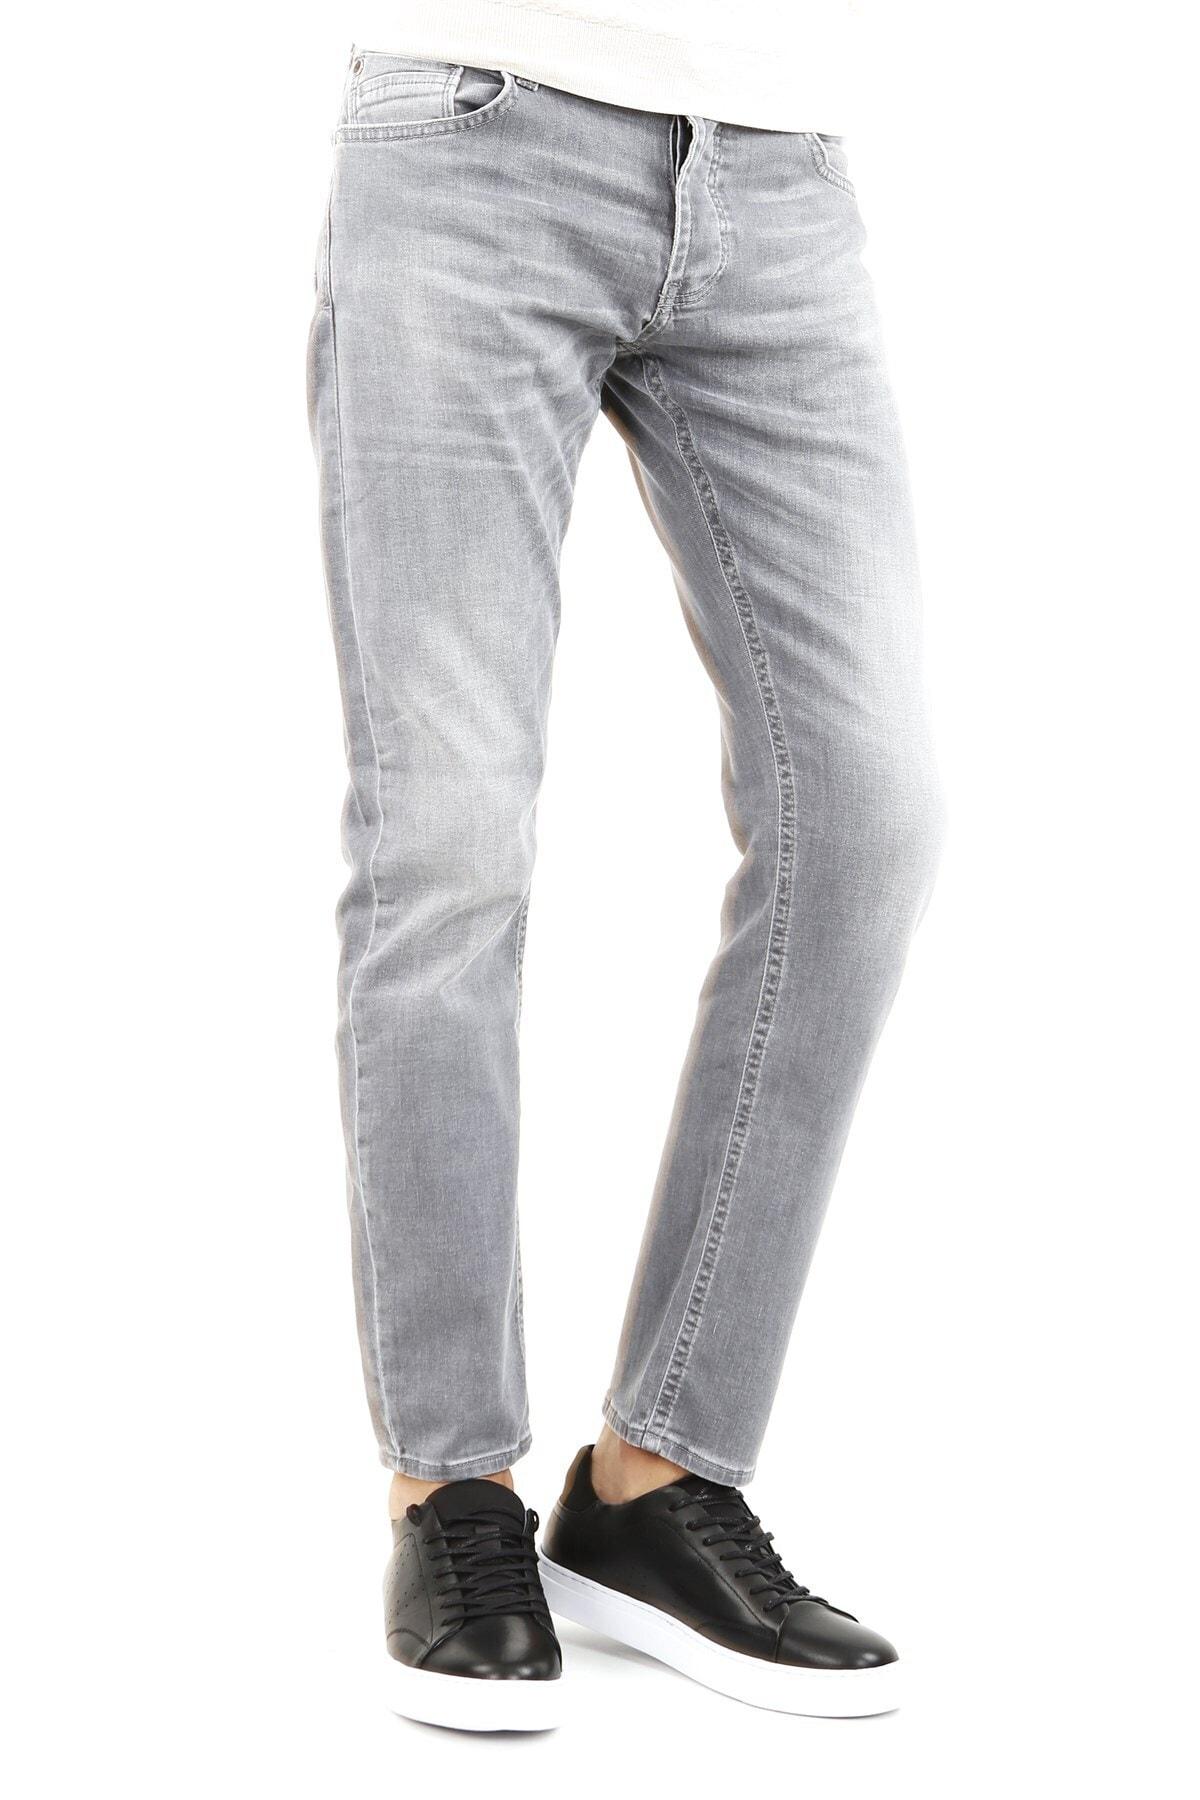 Jakamen Klasik Kalıp - Regular Fit Serili Kot Pantolon- 5 Cep Serili 1